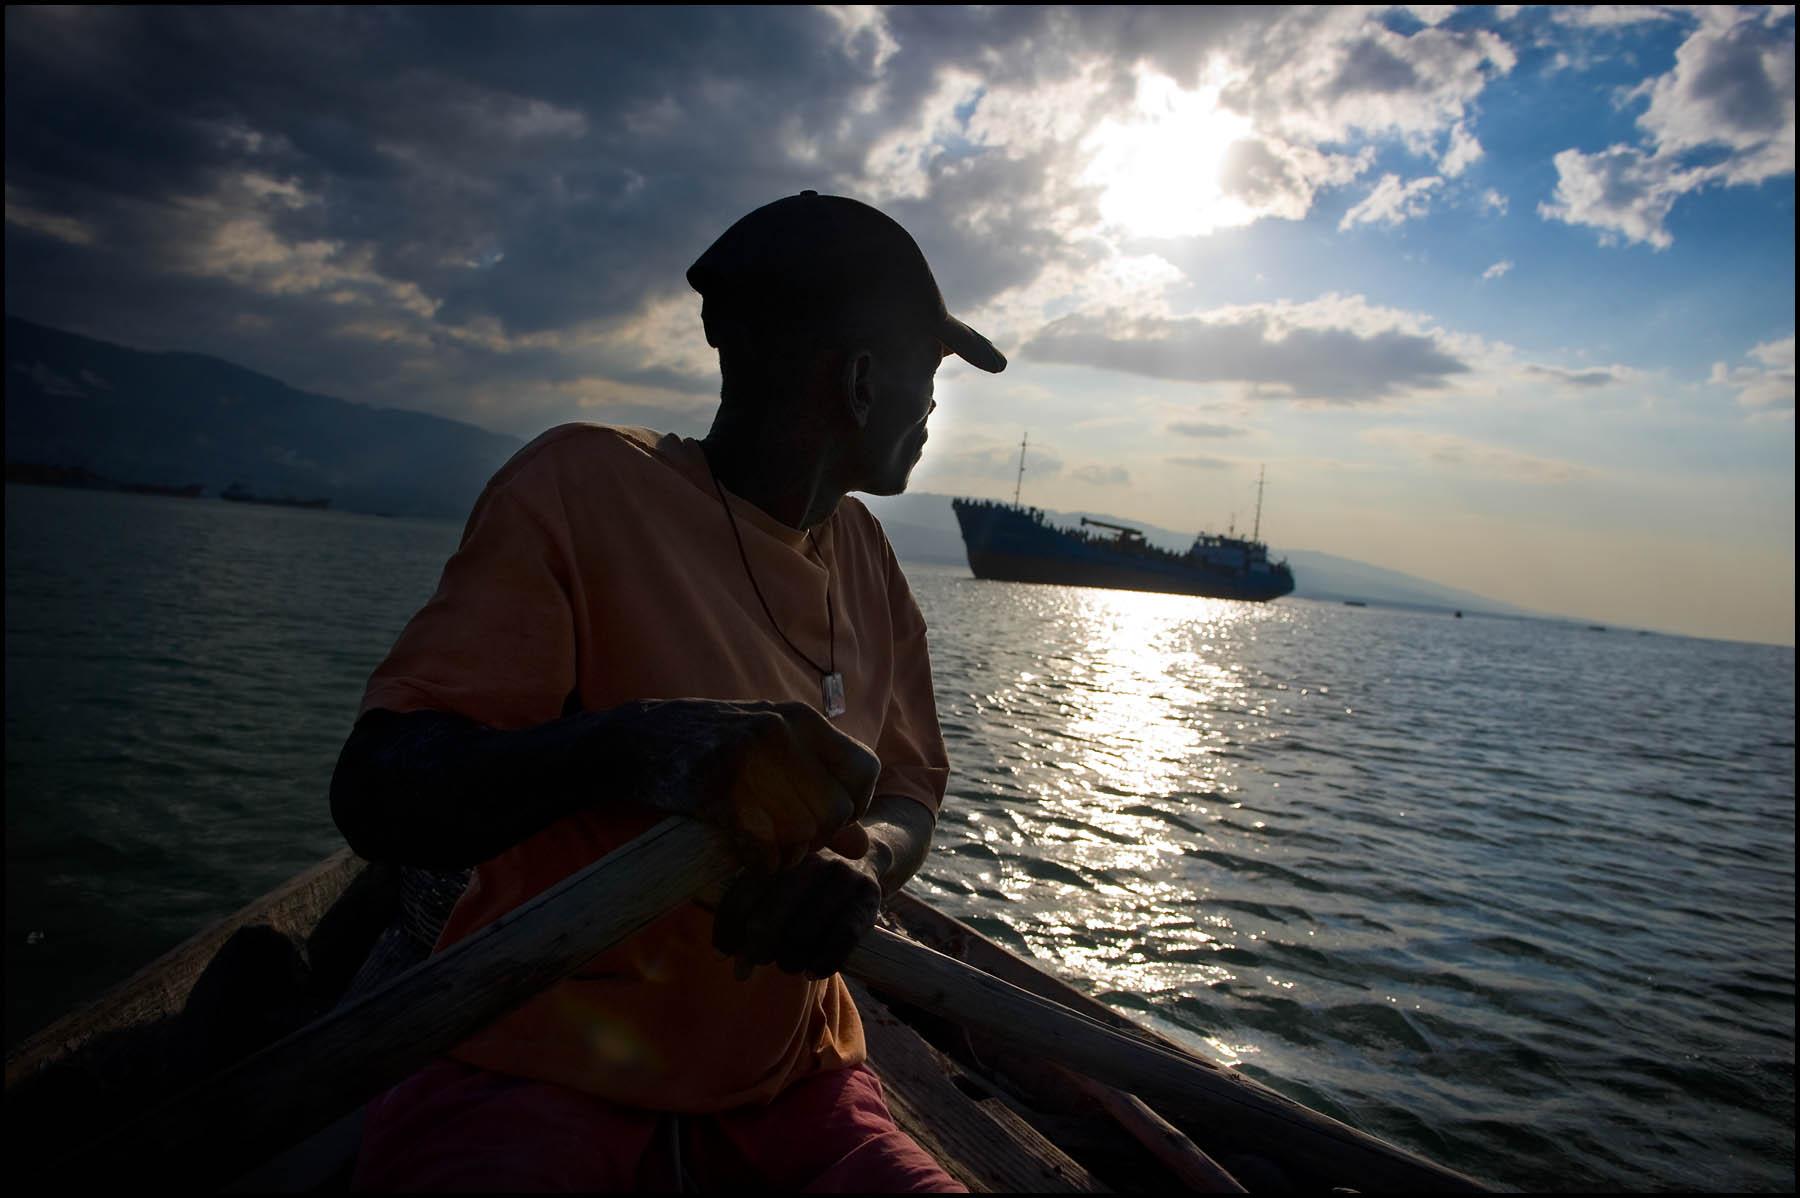 Haitian_Refugee